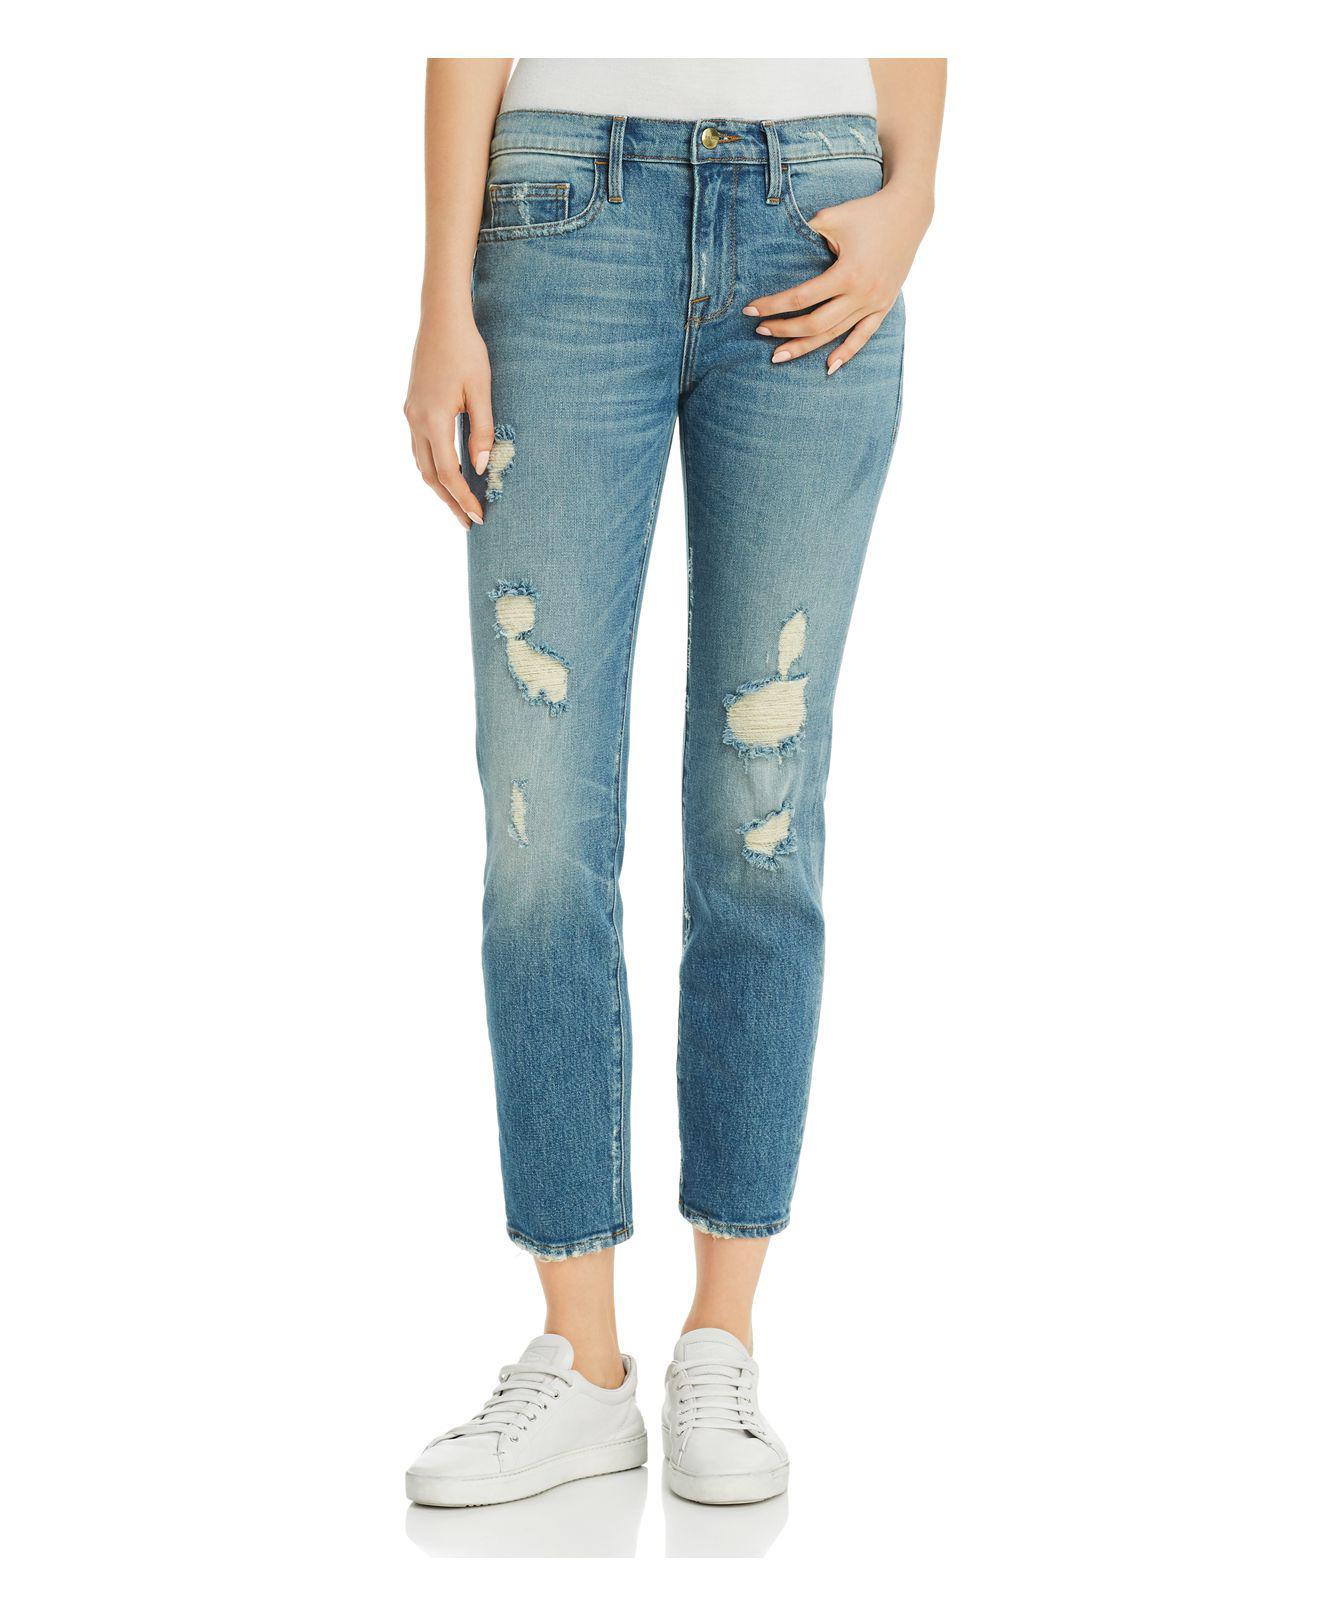 Le Boy Straight Leg Jeans - Blue Frame Denim zXT5408